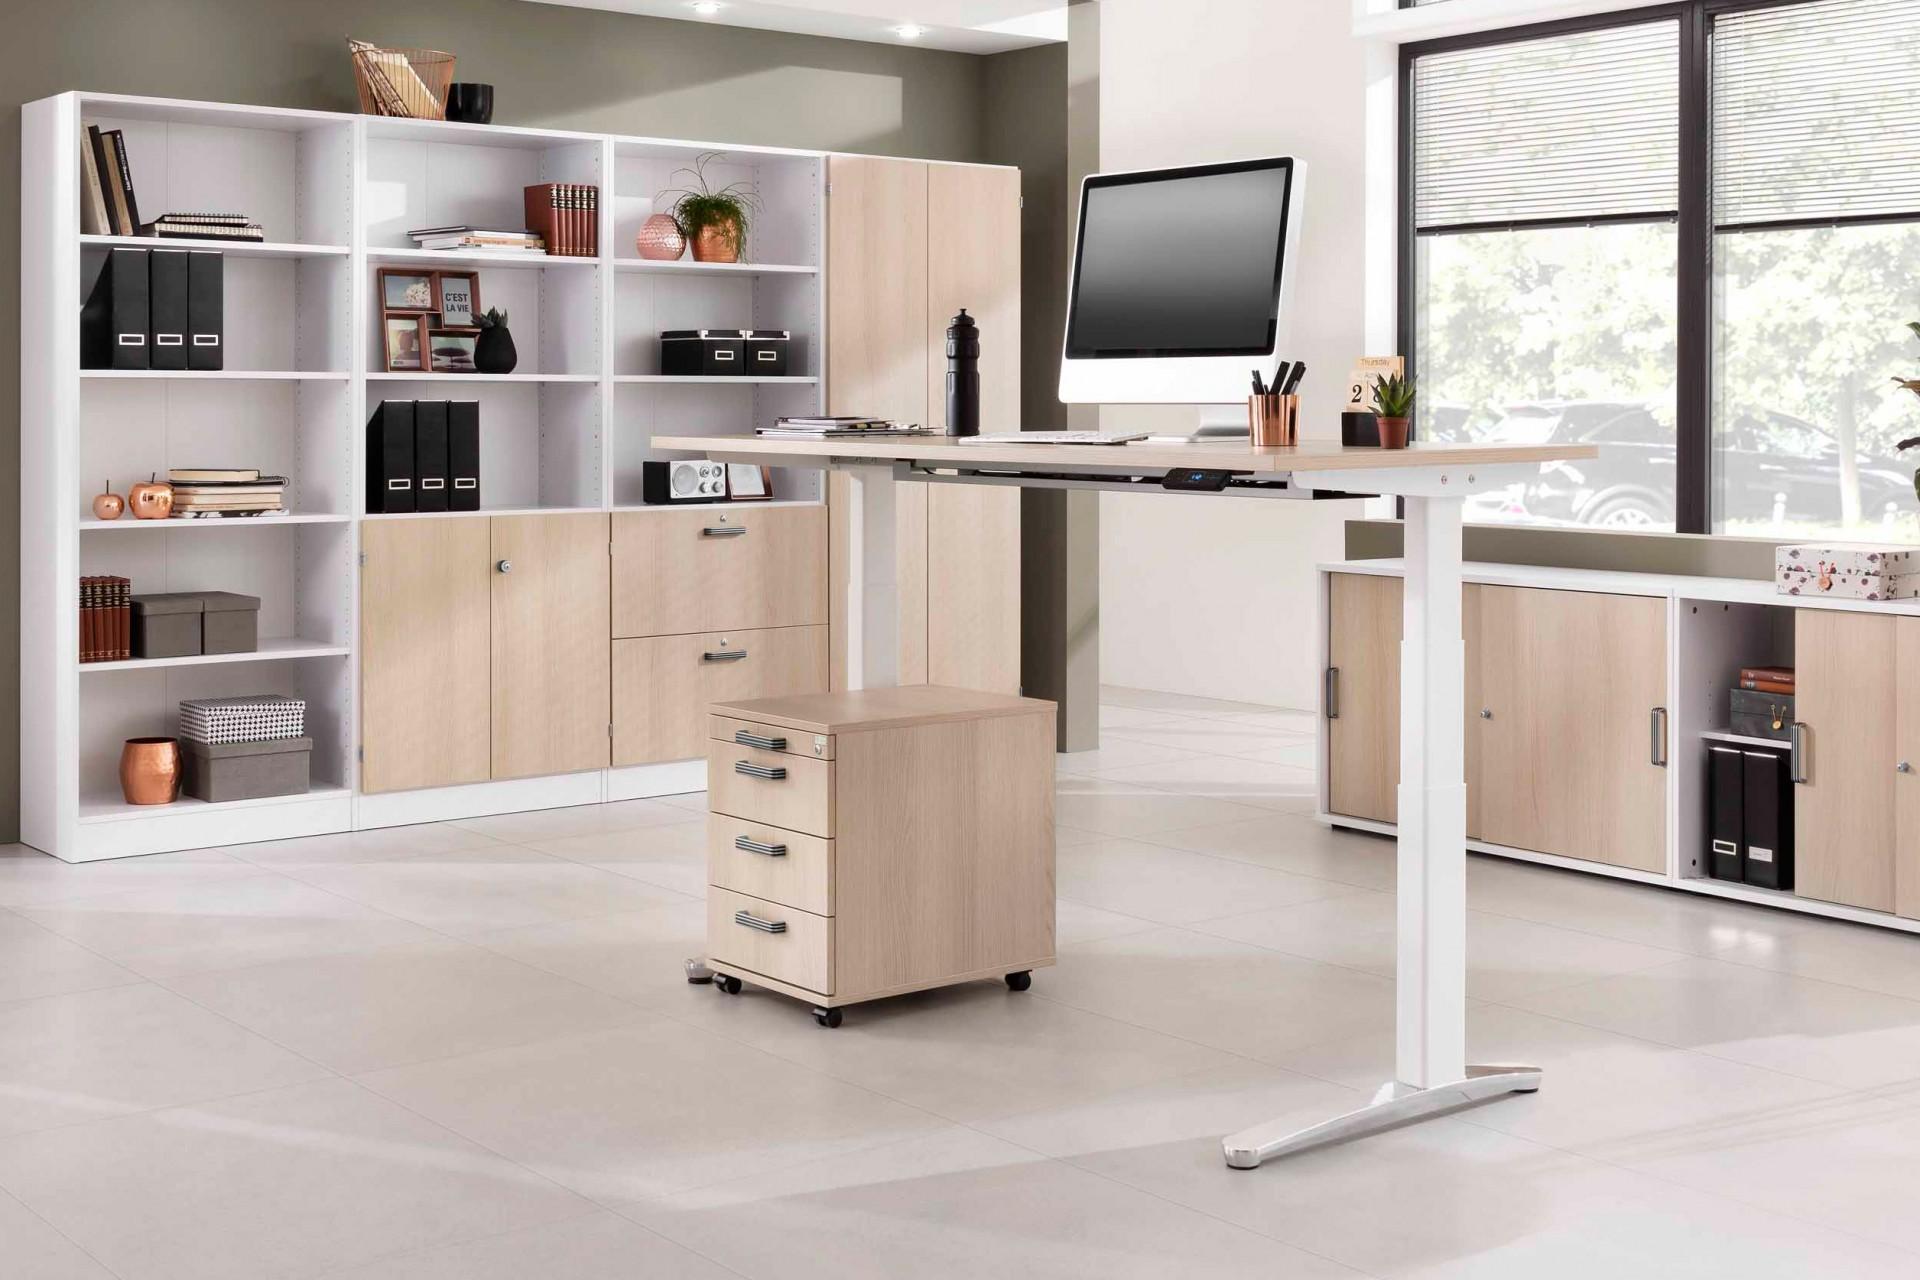 bureau assis debout lectrique roll 39 up. Black Bedroom Furniture Sets. Home Design Ideas